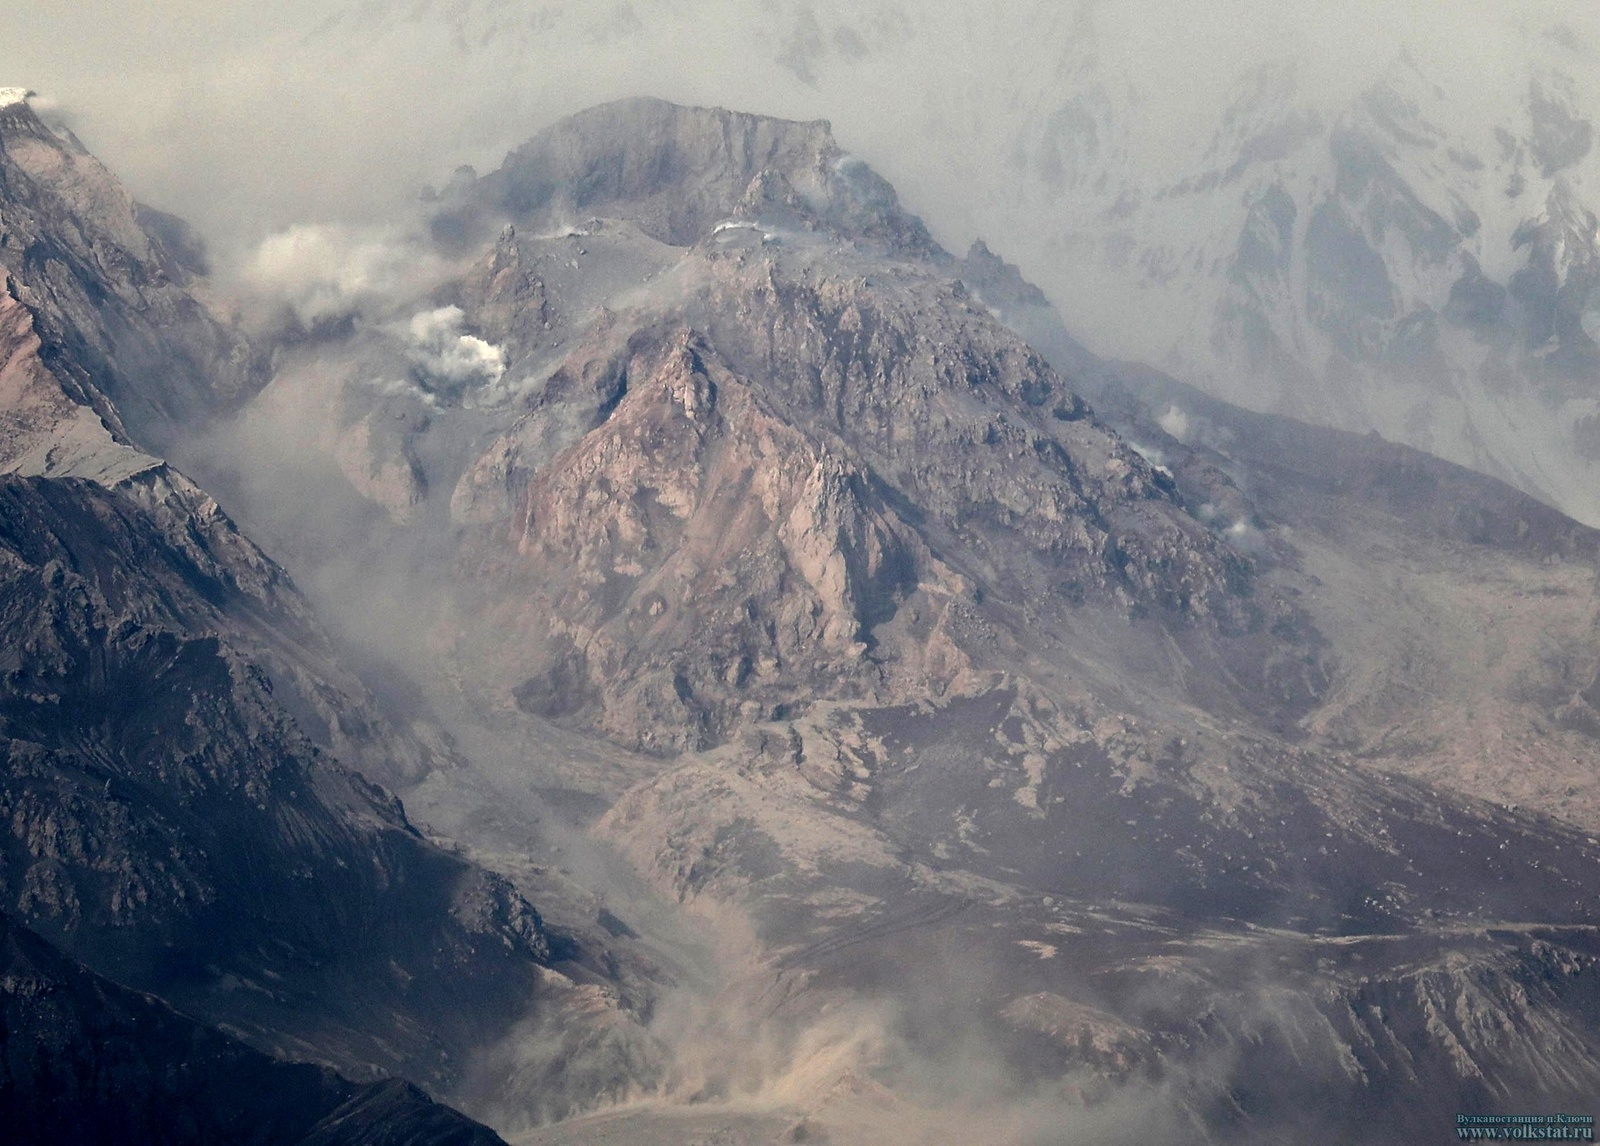 kamchatka volcano eruption, kamchatka volcano eruption june 2017, kamchatka volcano eruption video, kamchatka volcano eruption pictures